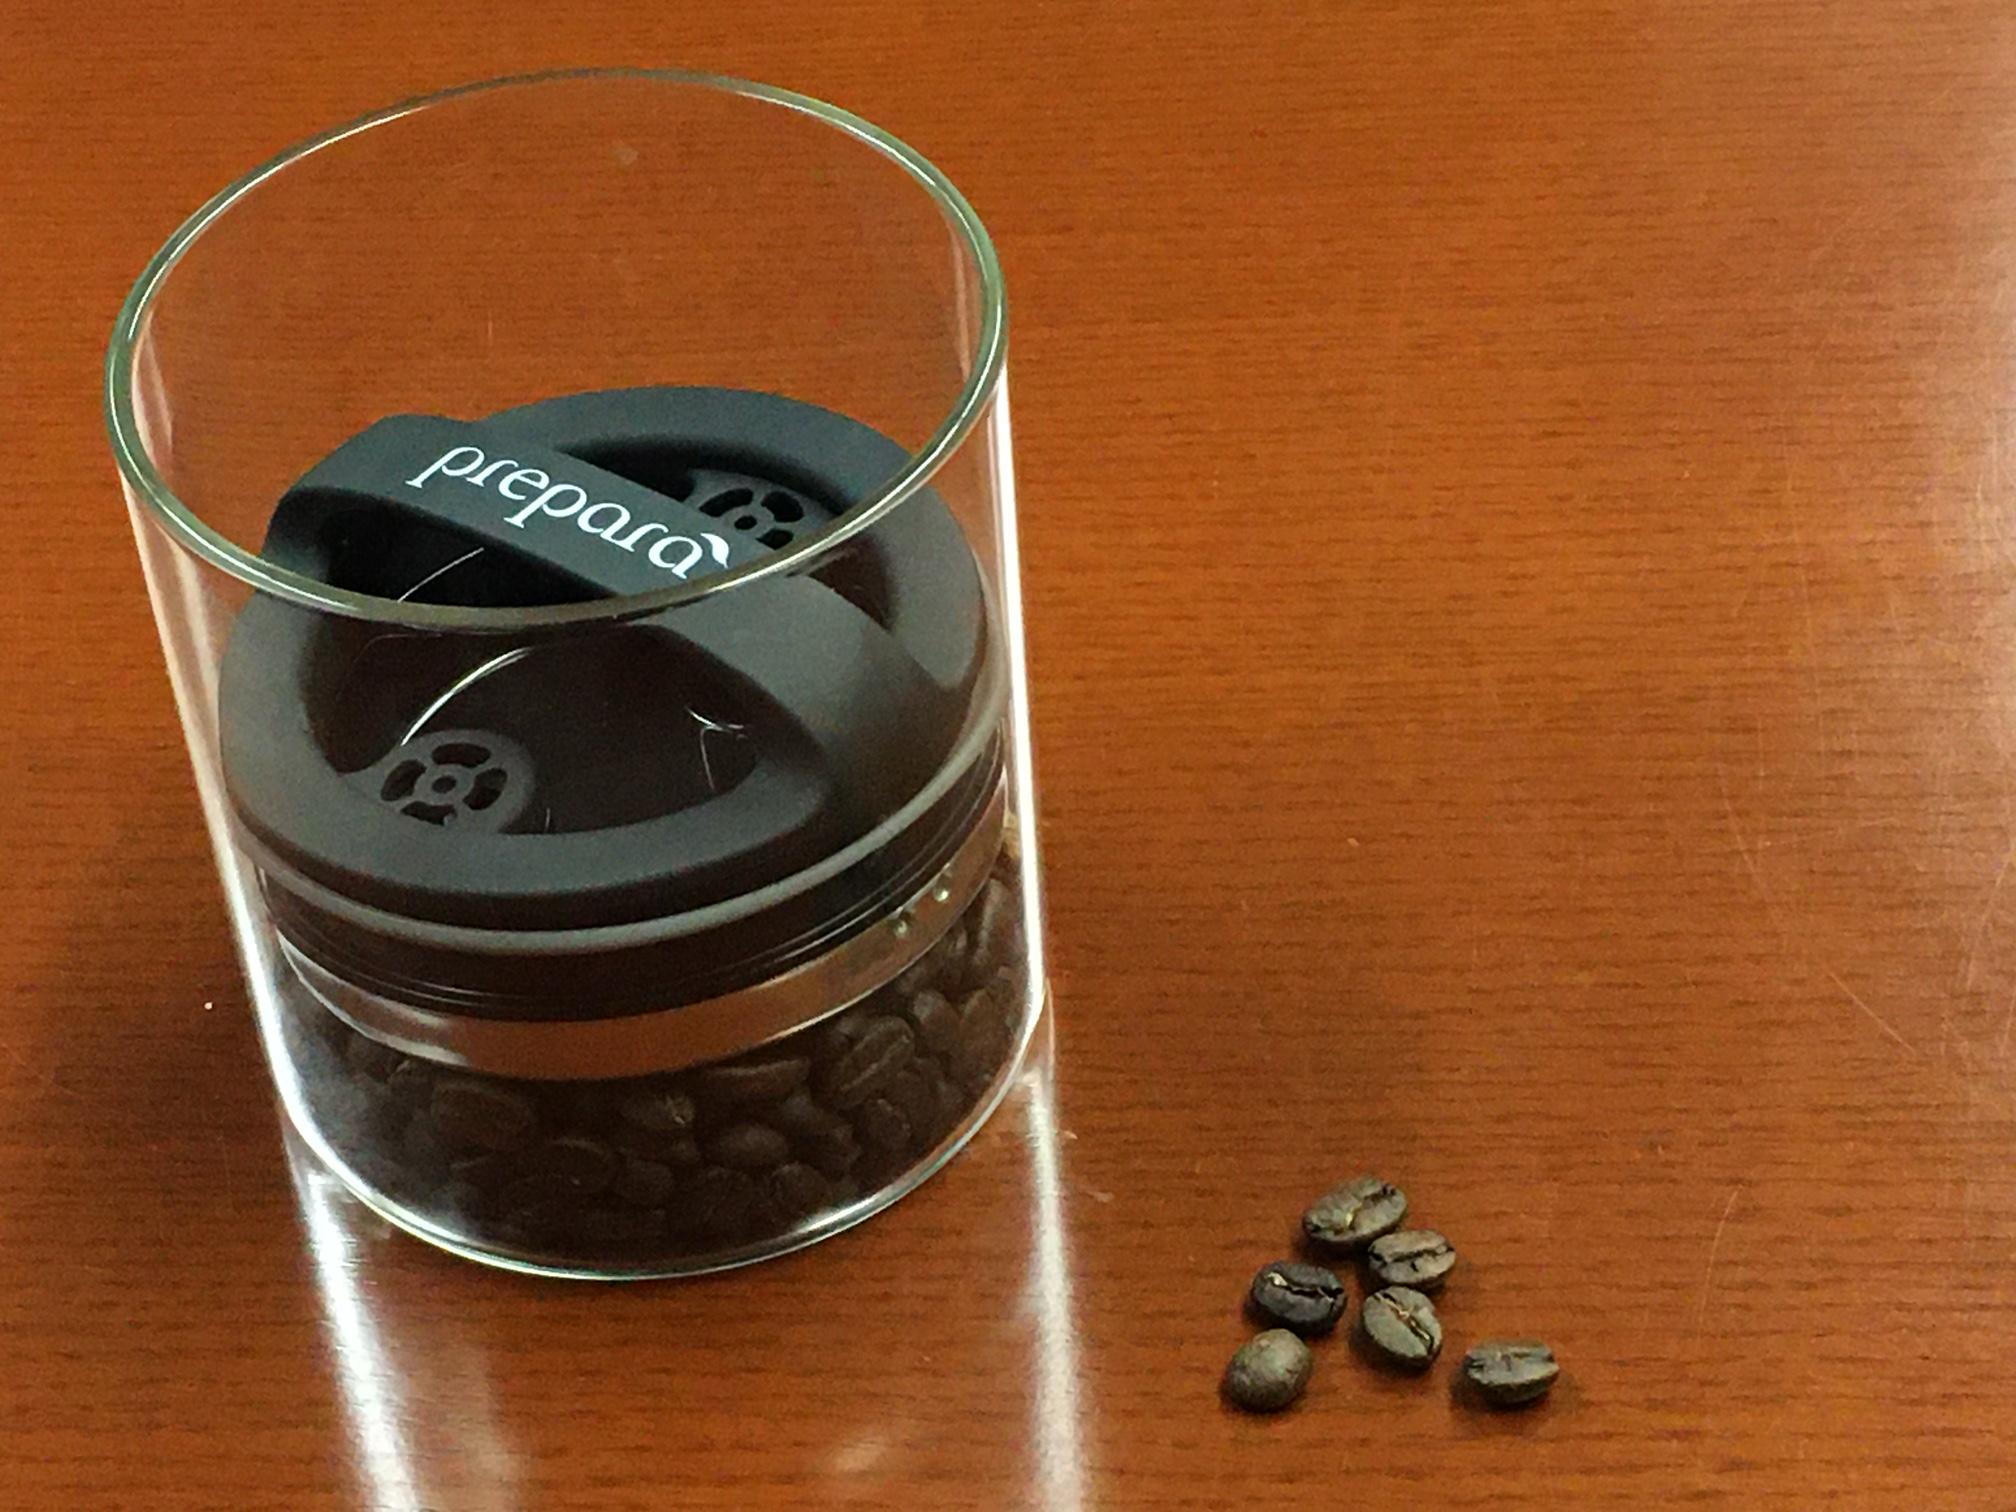 「PREPARA プレパラ EVAK イヴァーク エアタイト フード ストレージ」コーヒーキャニスターとしても大人気!